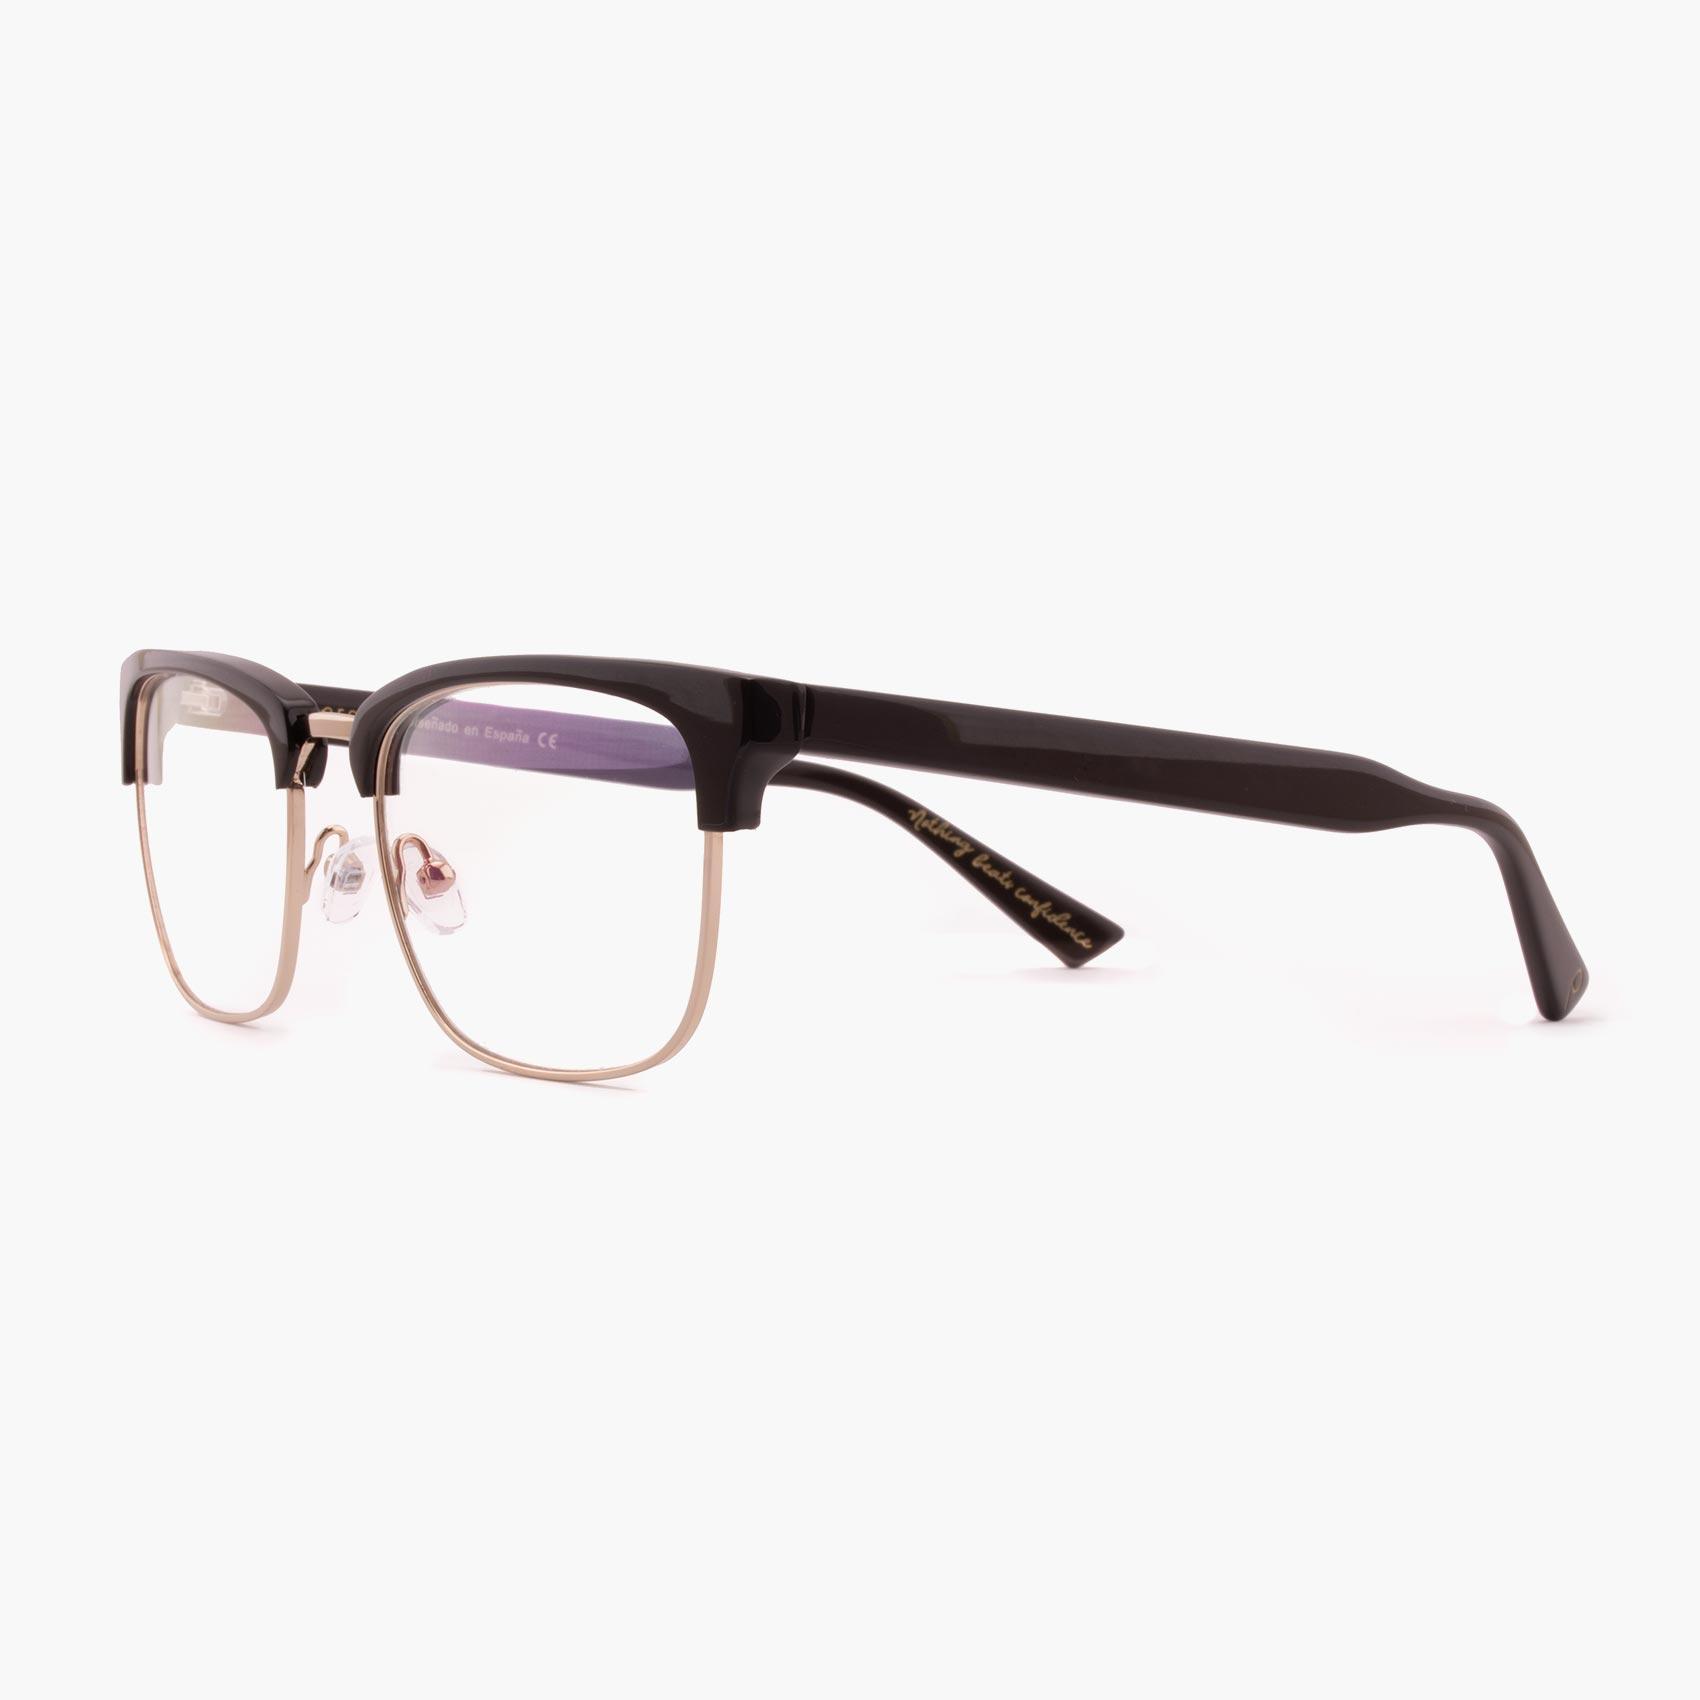 Proud eyewear Hopkins C2 L montura graduada clubmaster negras